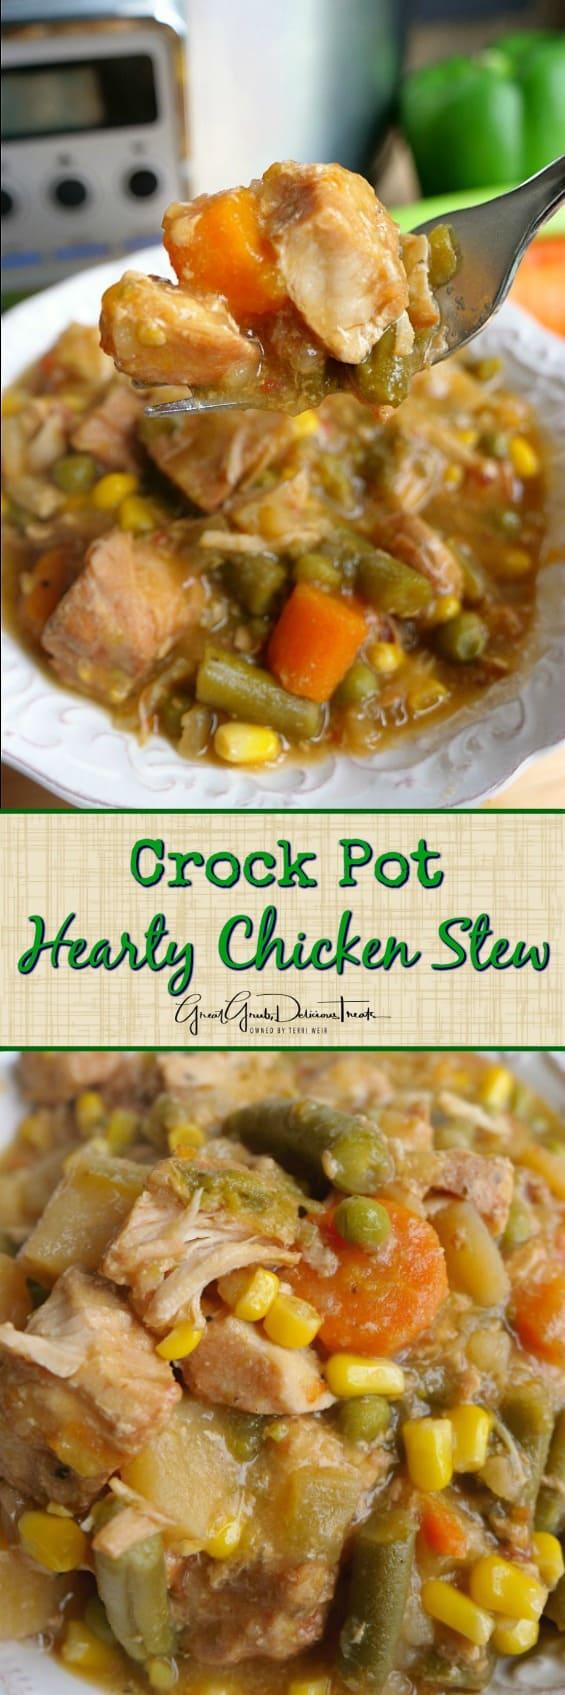 Crock Pot Hearty Chicken Stew